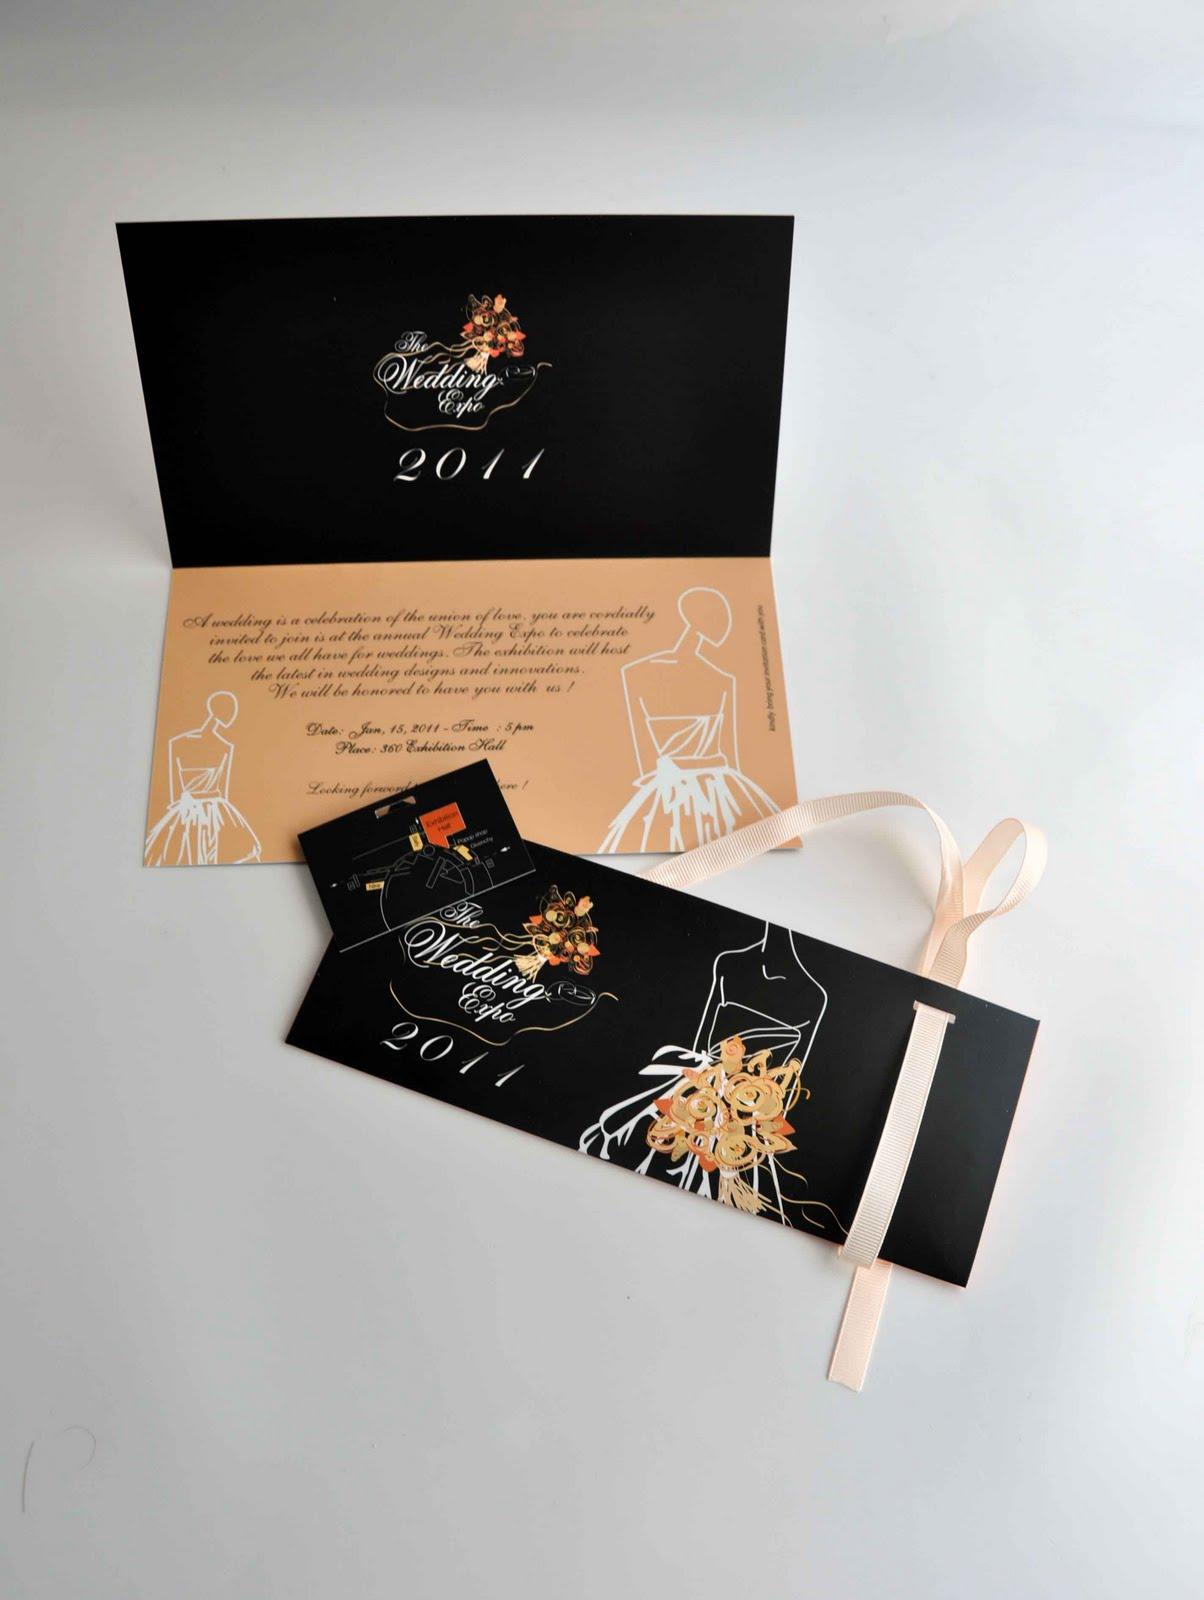 wedding expo invitation card + booklet | Mohamad jaafar